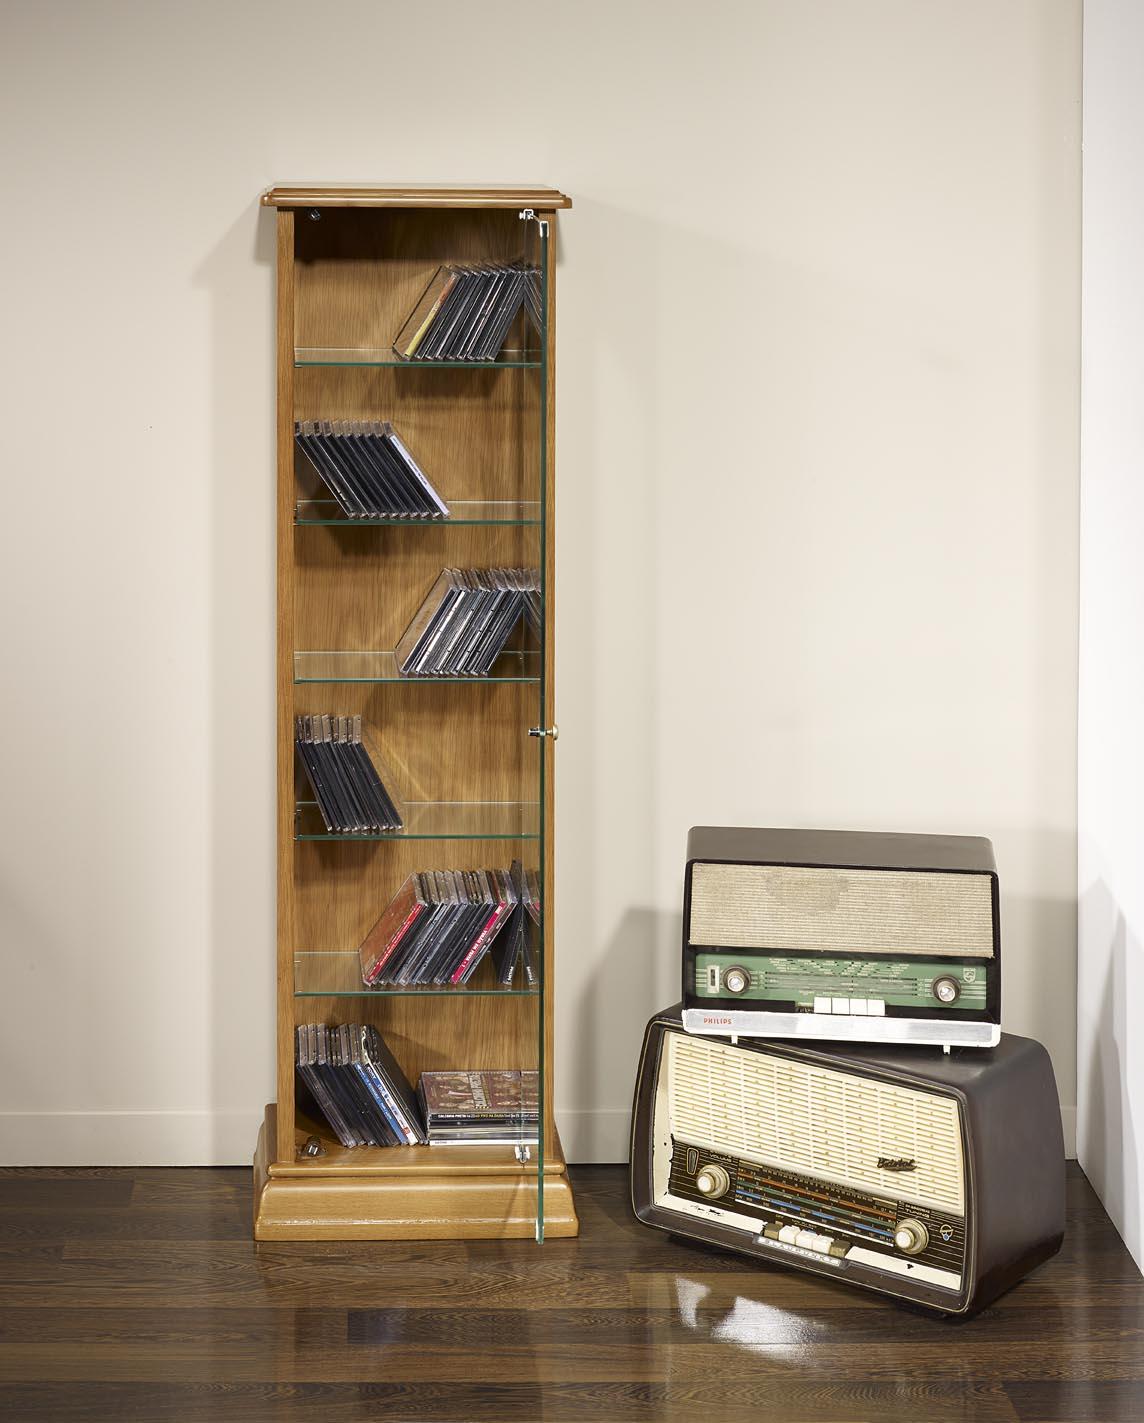 Pmc115 mueble torre cd dvd hecho de roble macizo estilo - Mueble para dvd ...